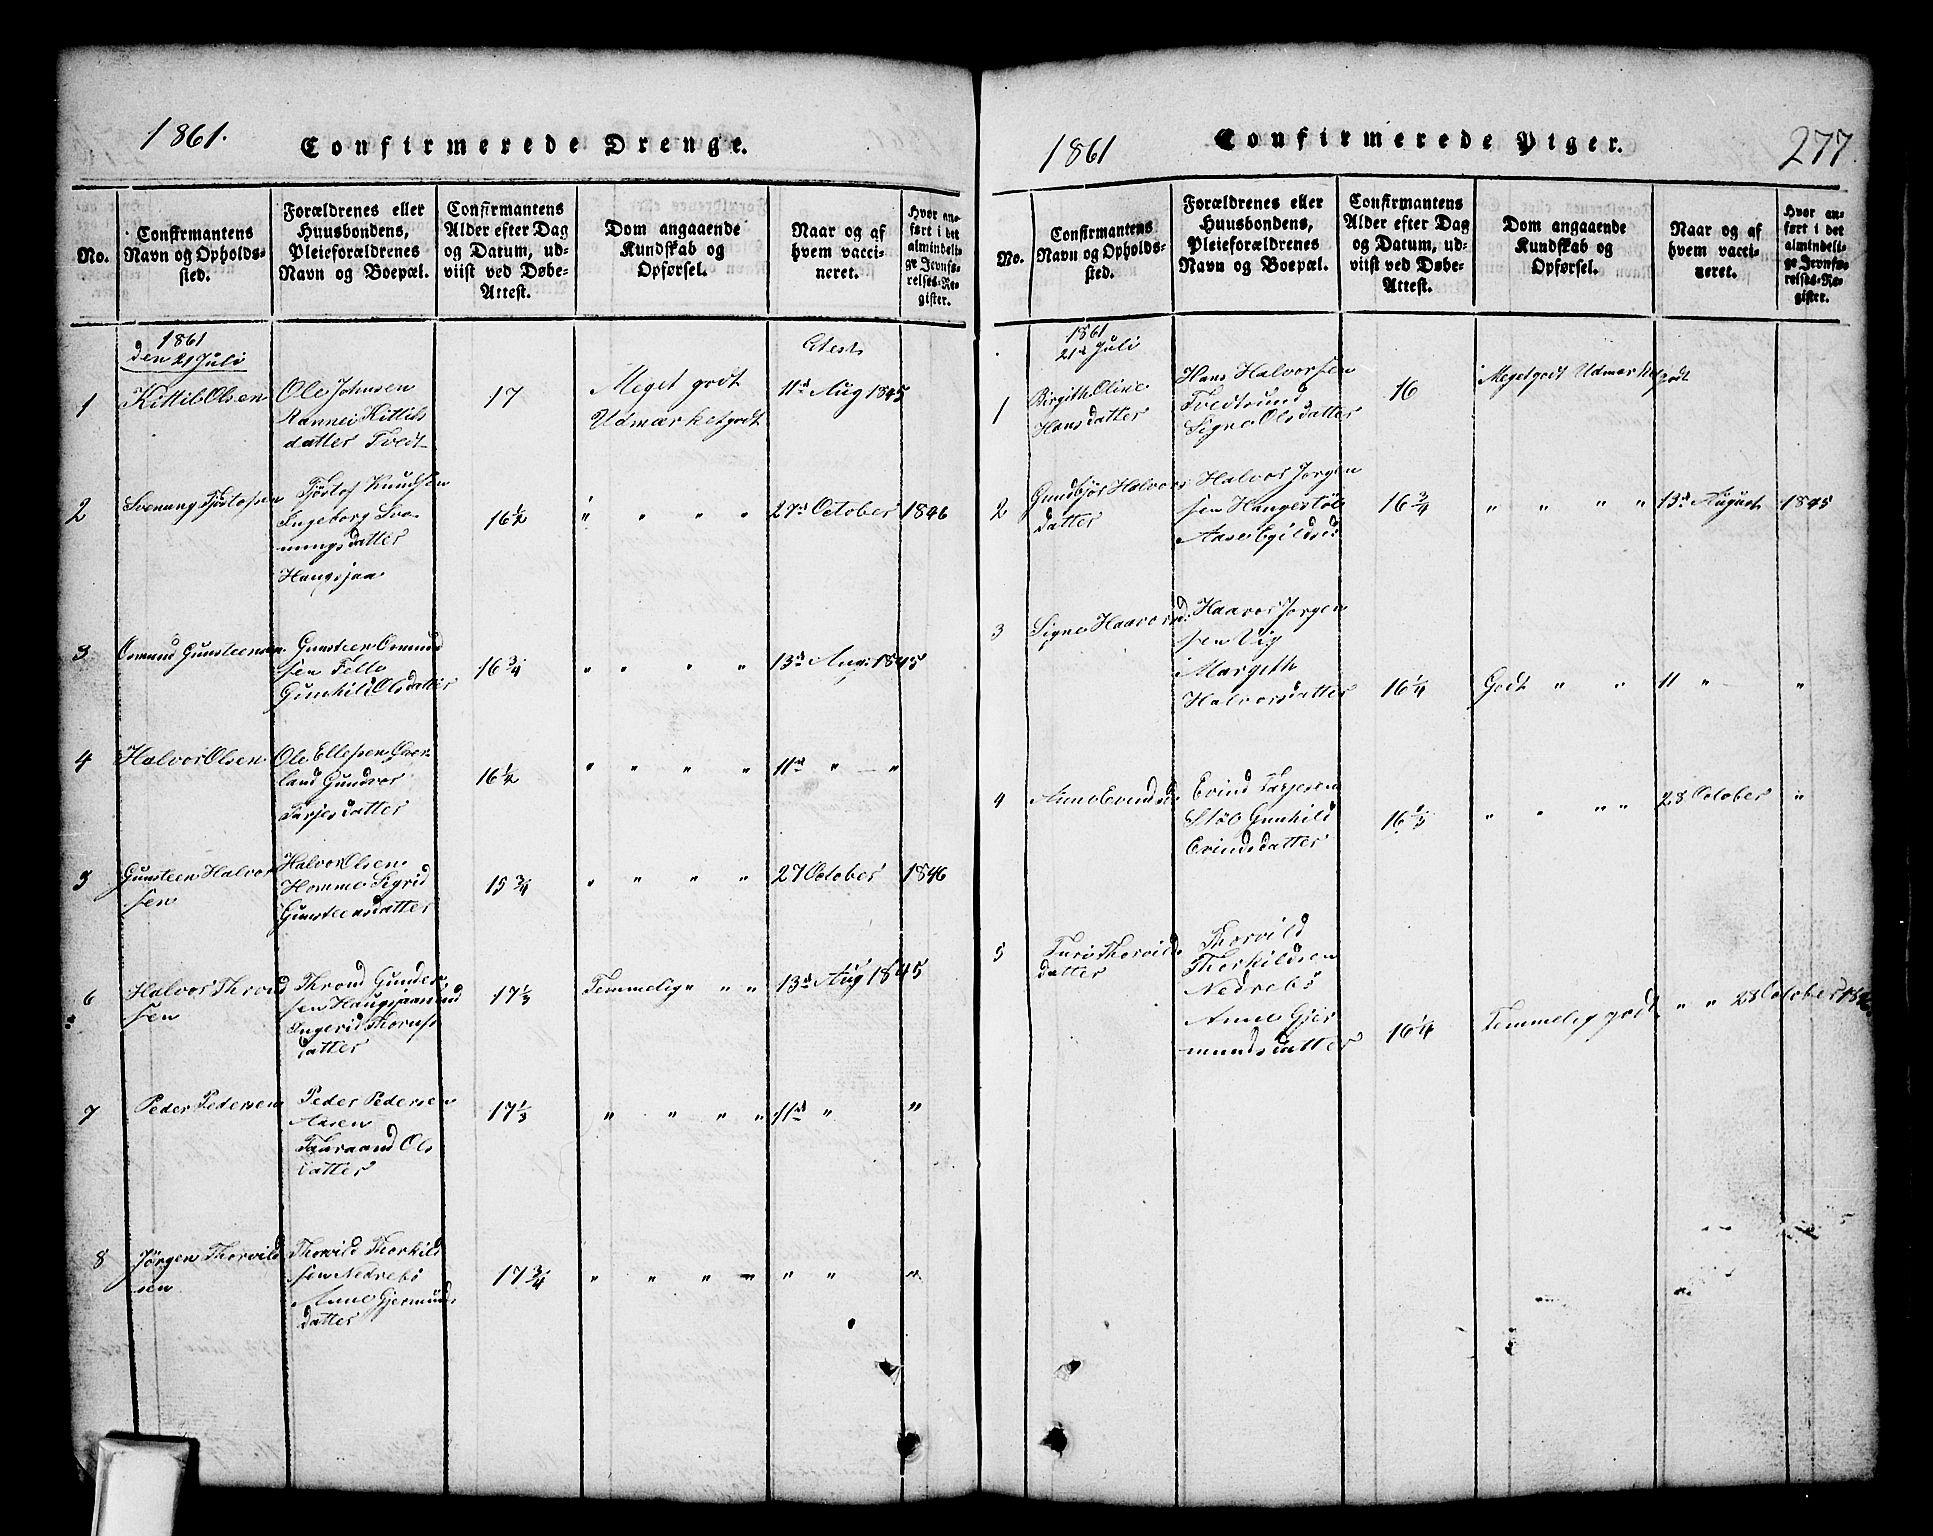 SAKO, Nissedal kirkebøker, G/Gb/L0001: Klokkerbok nr. II 1, 1814-1862, s. 277